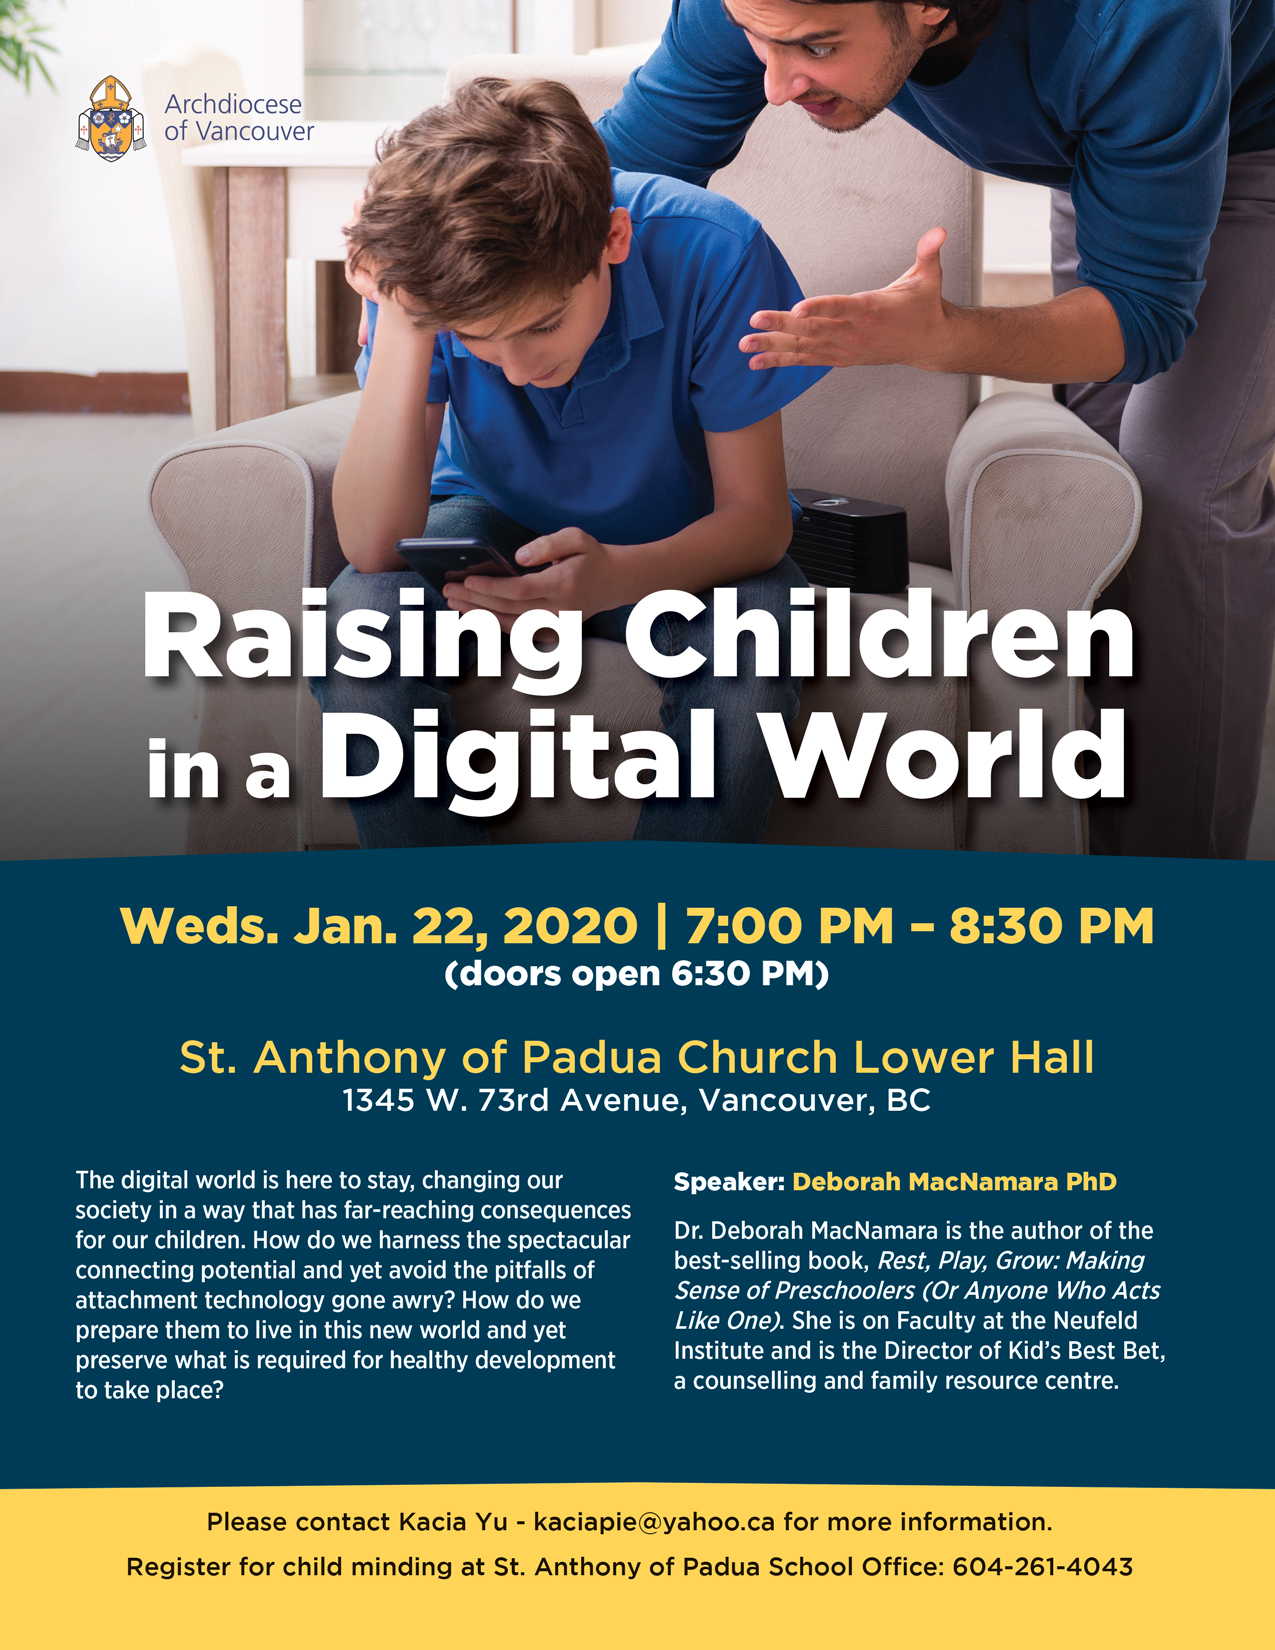 Raising Children in a Digital World @ St. Anthony of Padua Church Lower Hall